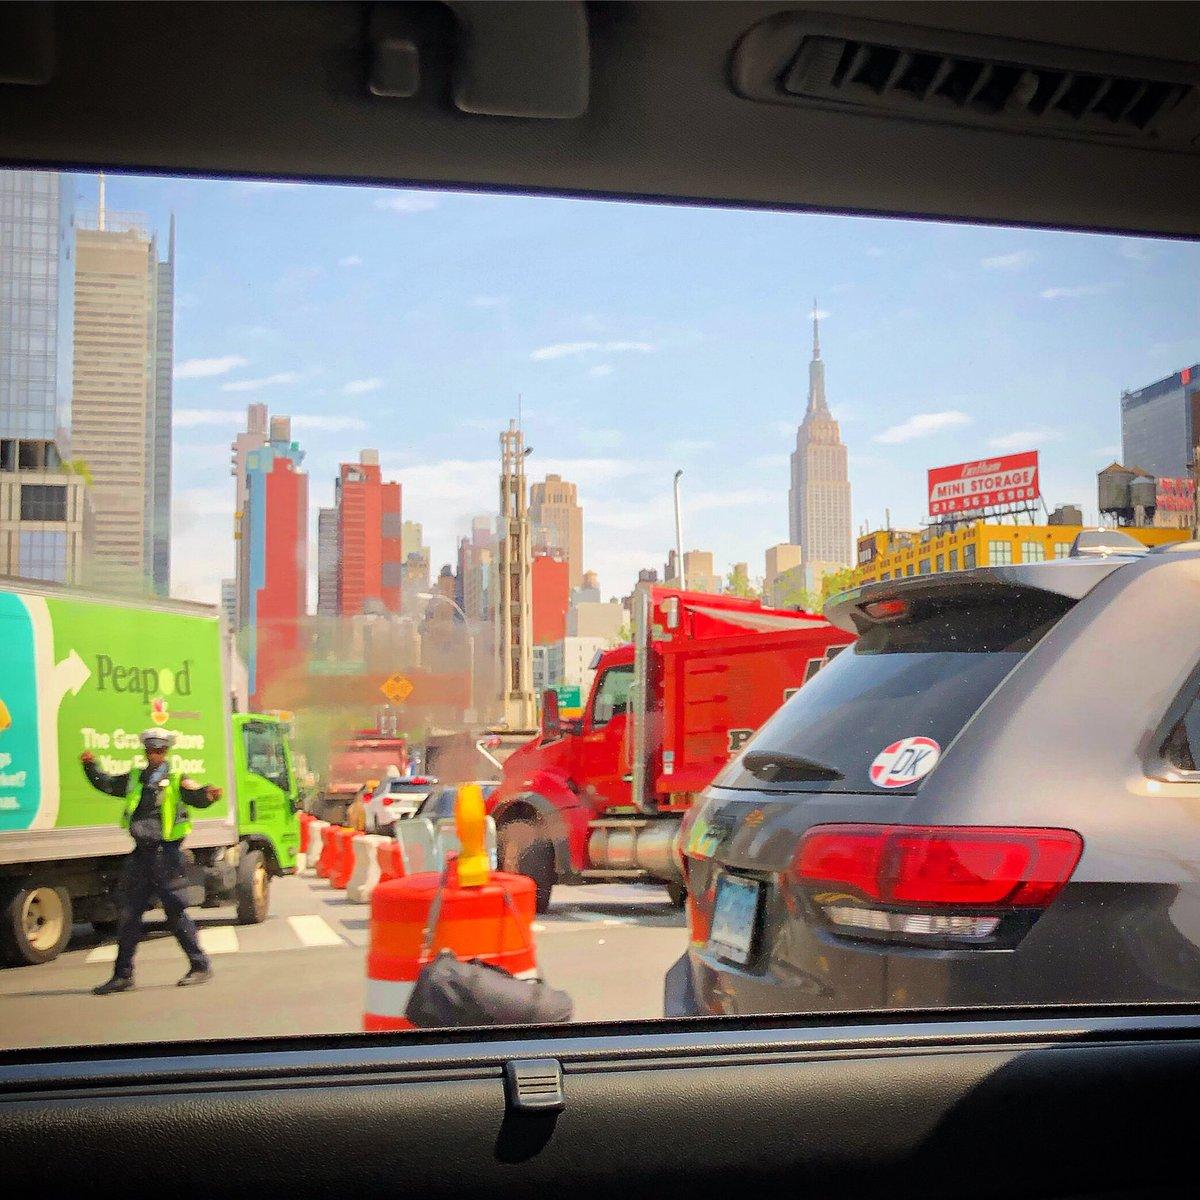 City life #nyc #EmpireStateBuilding